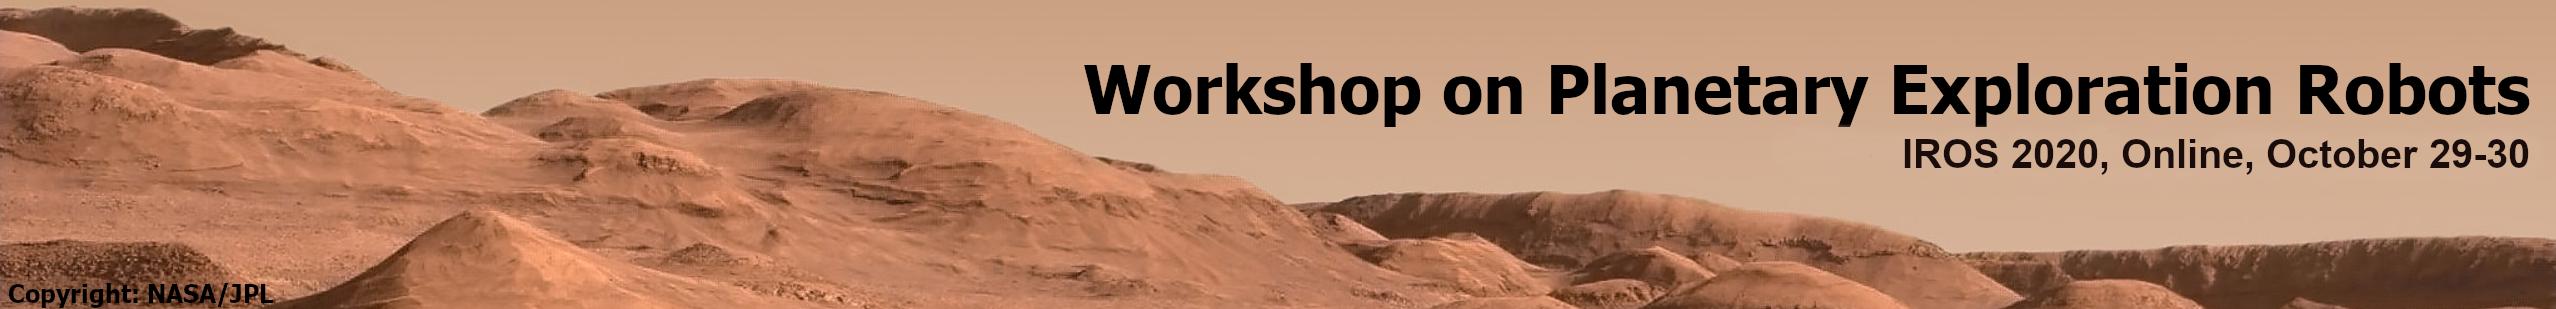 Workshop on Planetary Exploration Robots